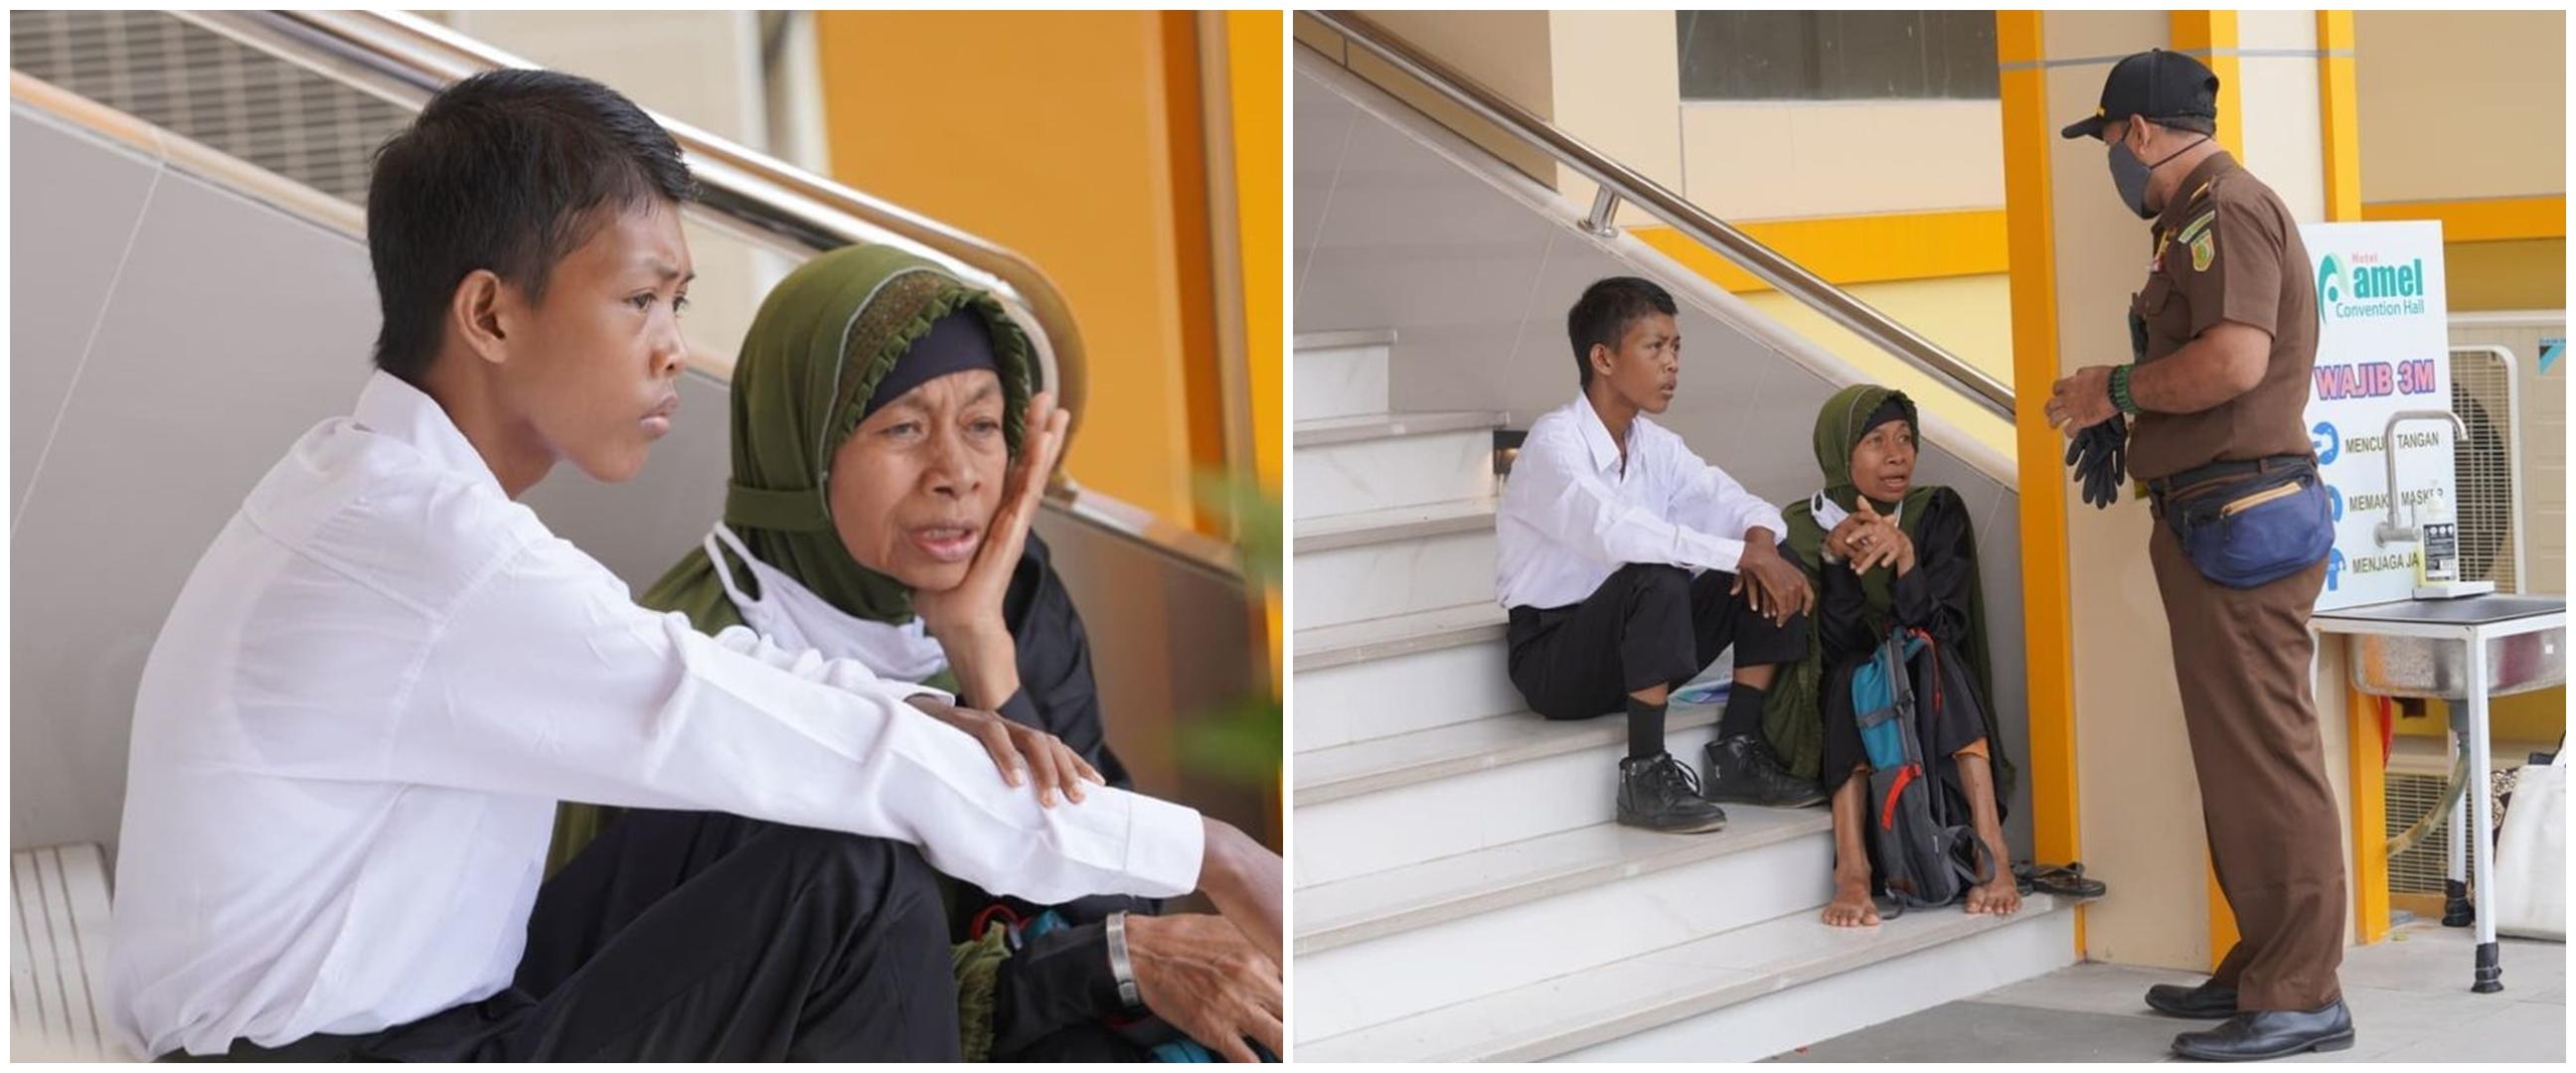 Momen menyentuh ibu temani sang anak tes seleksi CPNS, bikin terharu